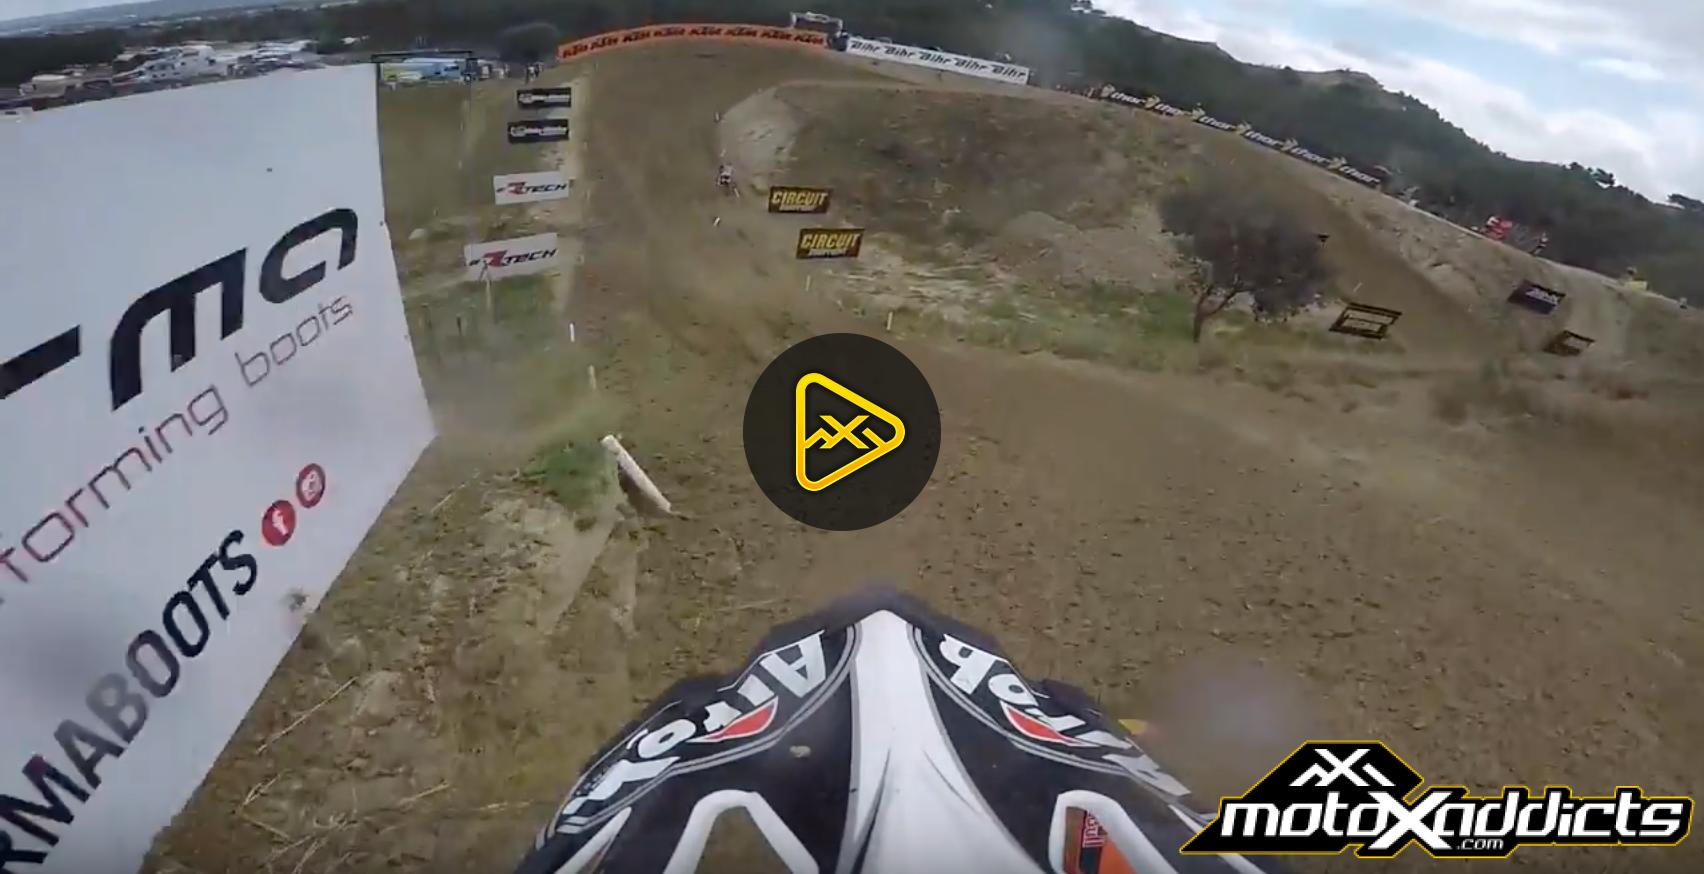 Helmet Cam: Glenn Coldenhoff Lap Around 2016 MXGP of Spain